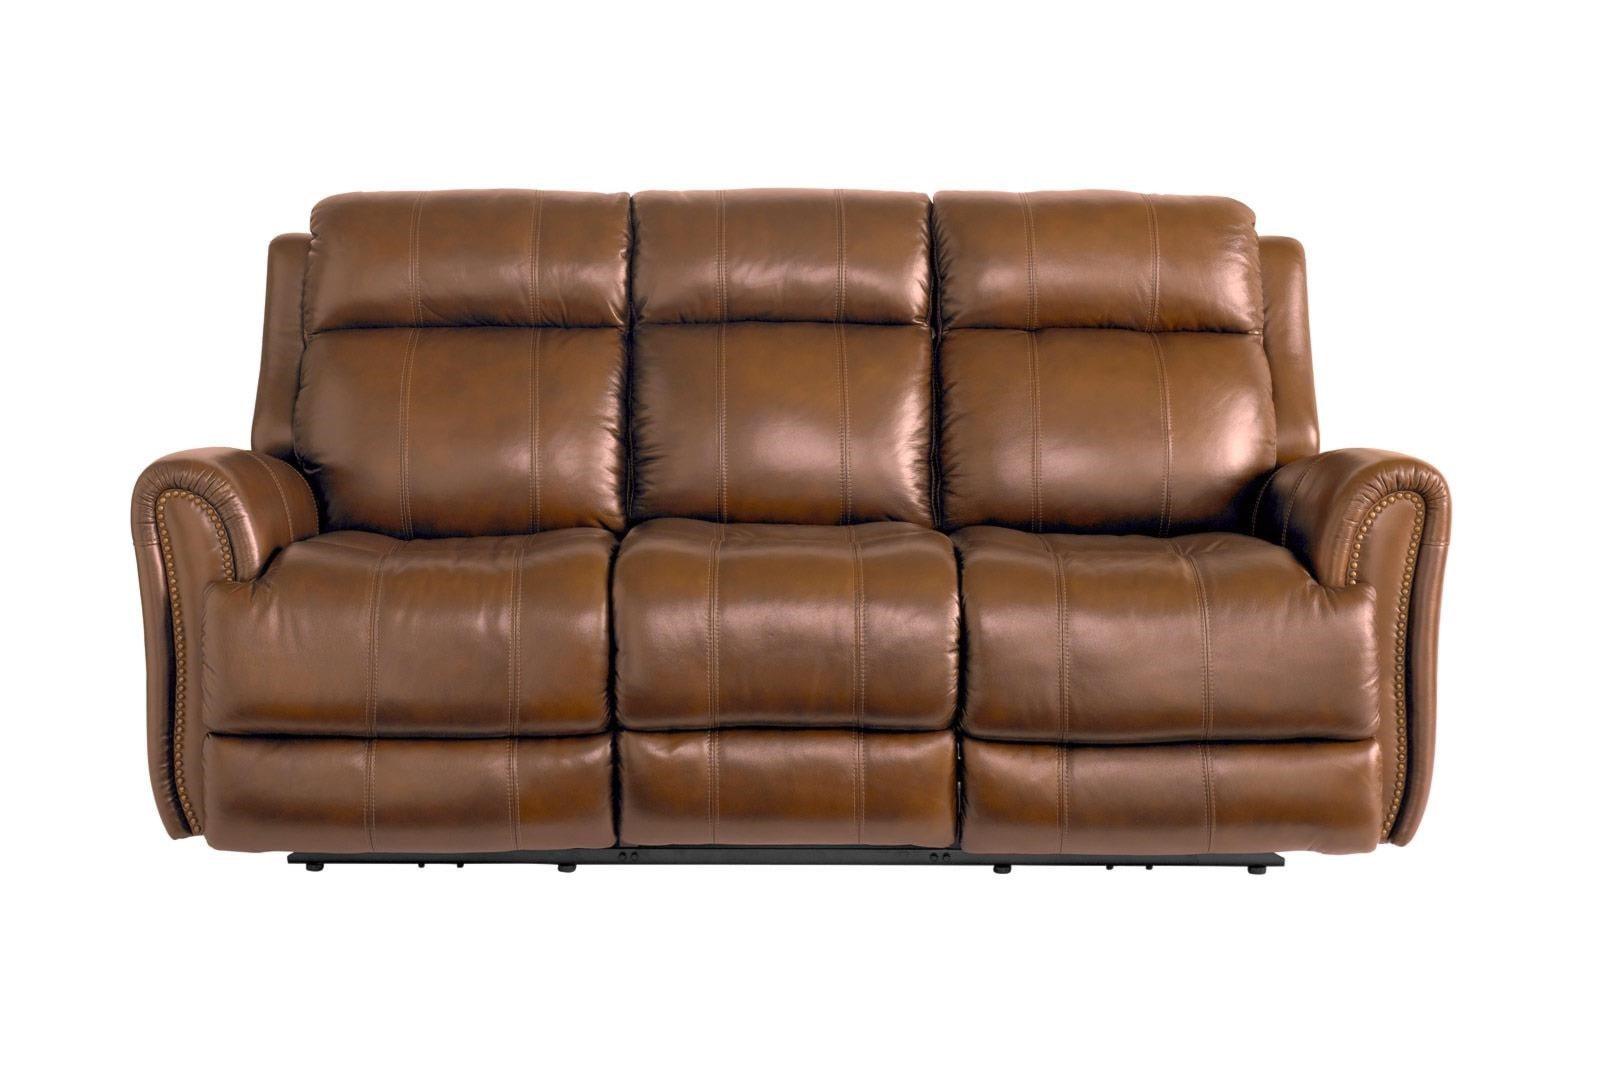 reclining sofa chair. Bassett MarqueeLeather Pwr Reclining Sofa W/Pwr Headrest Reclining Sofa Chair